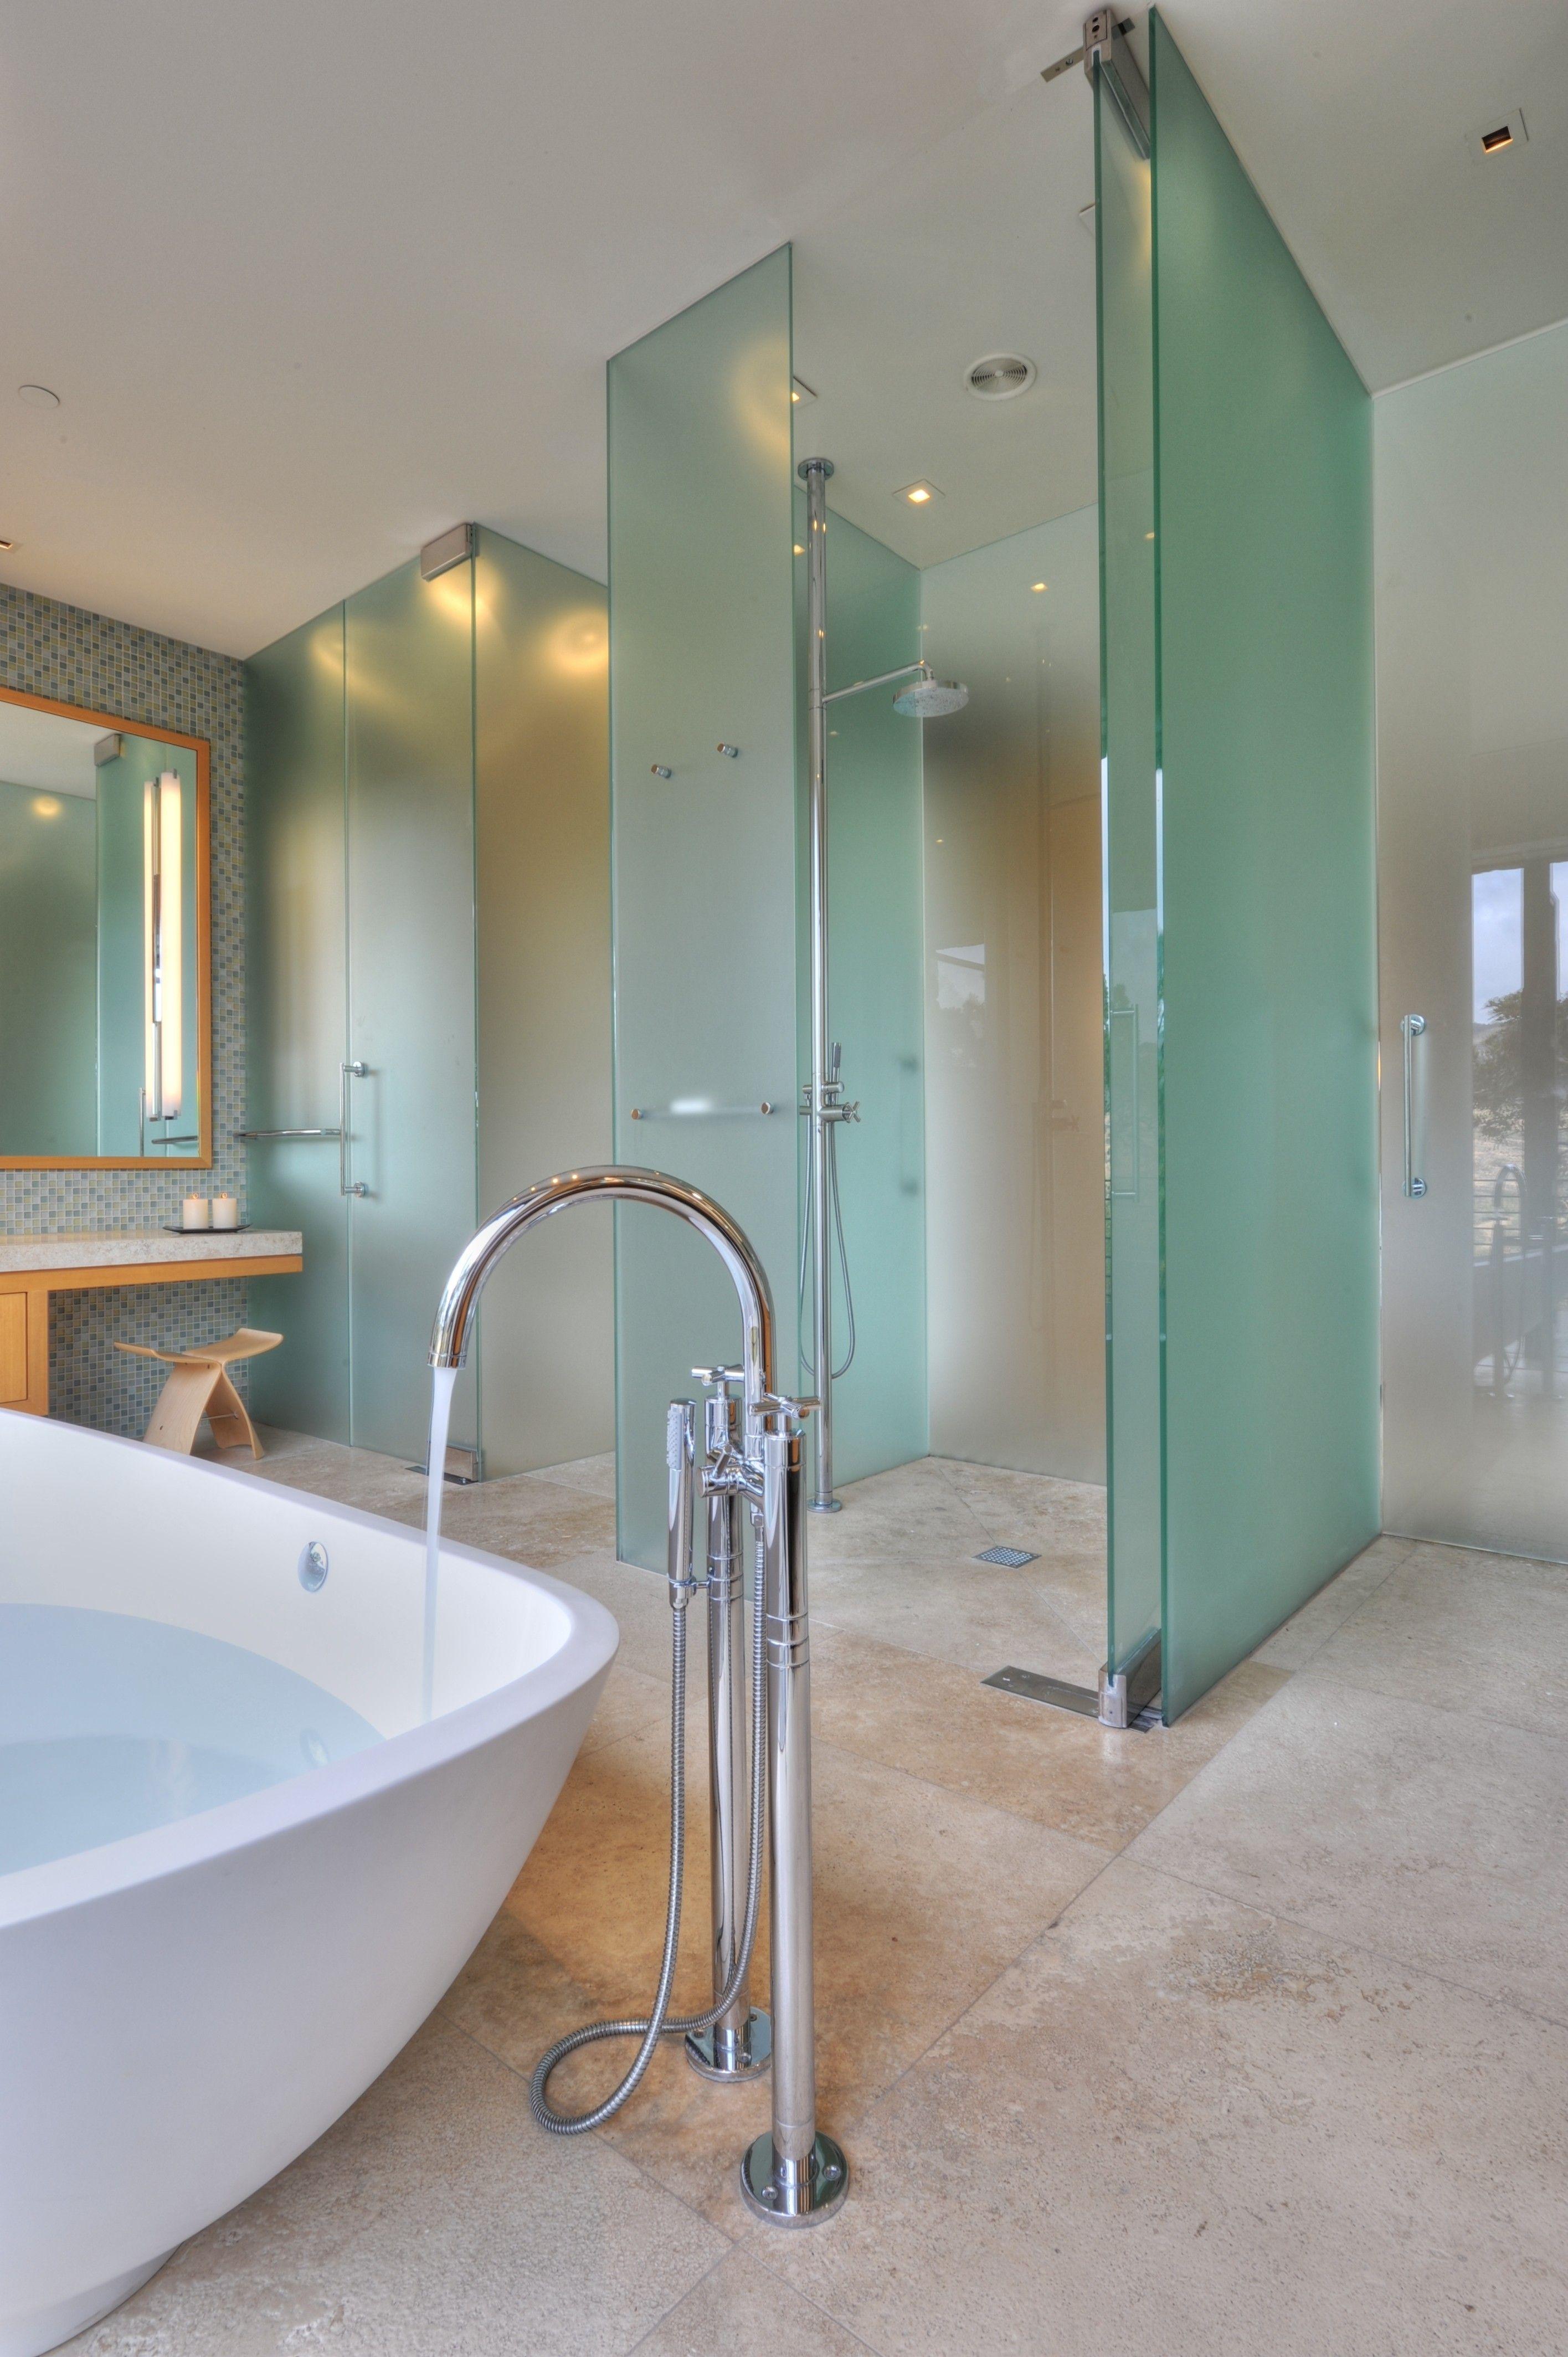 20 Beautiful Walk In Showers That You Ll Feel Like Royalty In